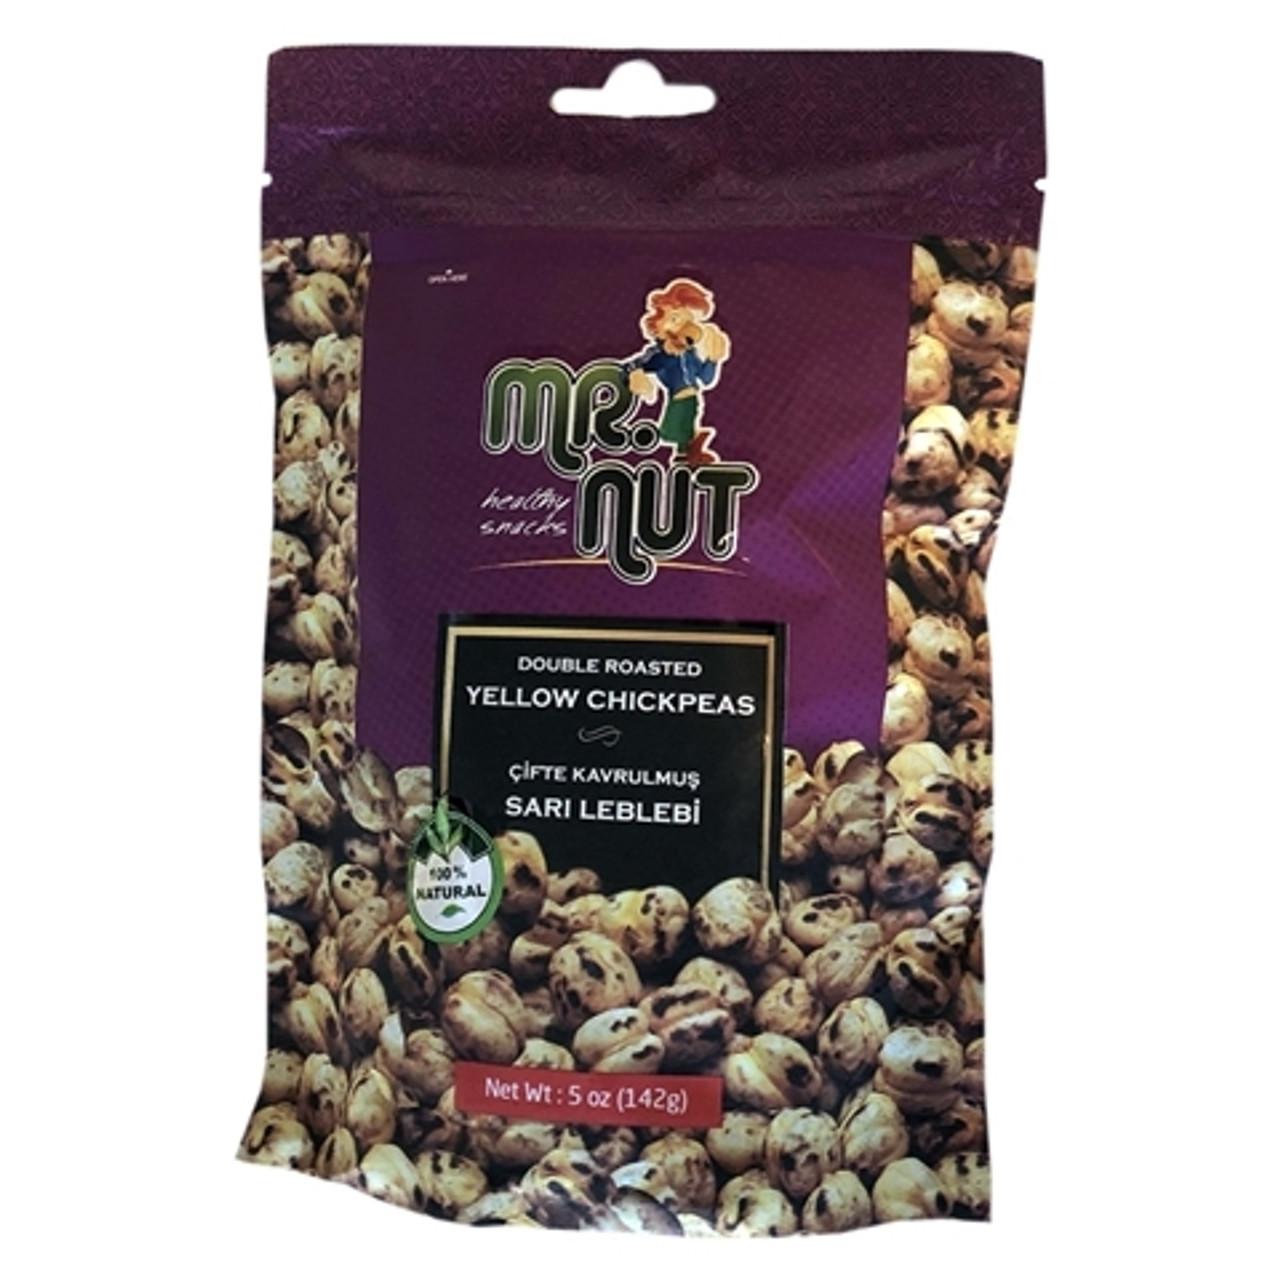 Double Roasted Chickpeas Mr.Nut 142g.